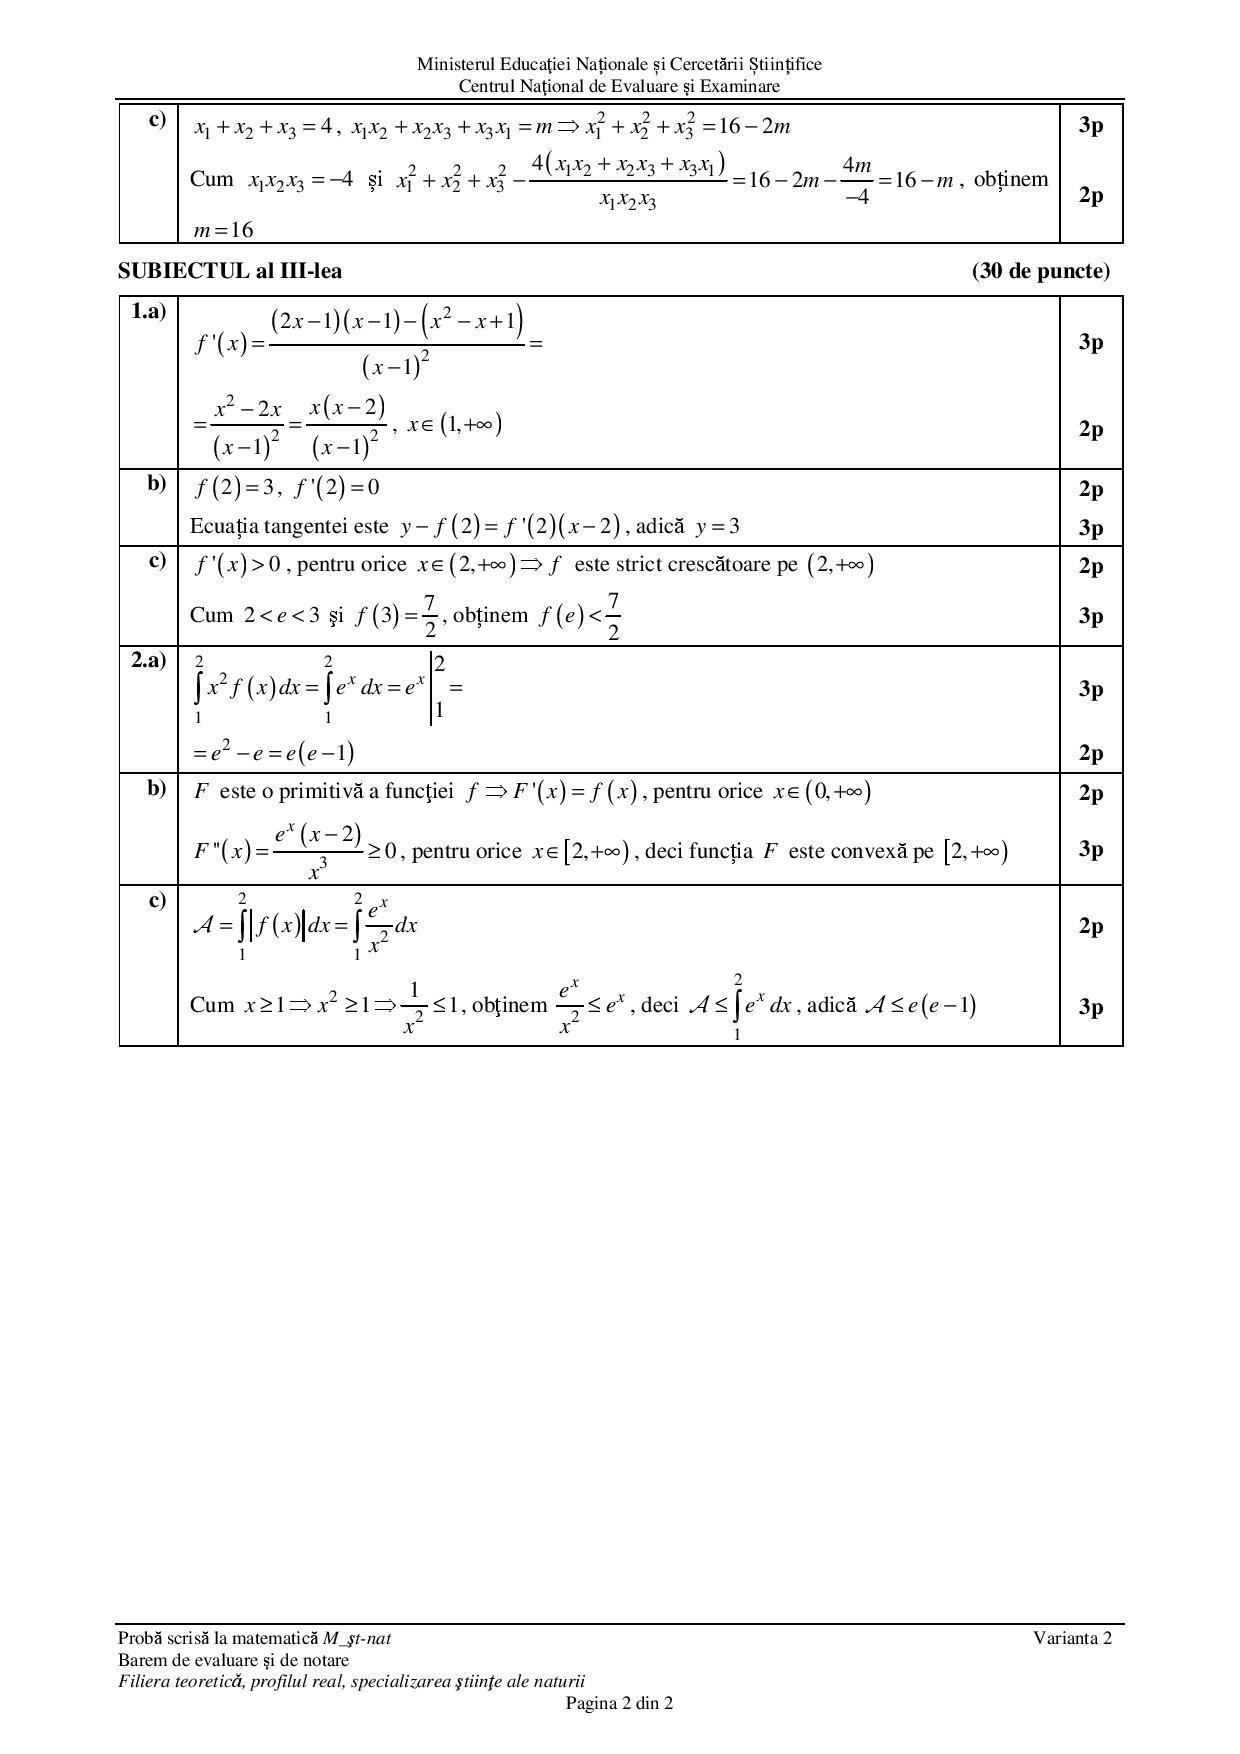 E_c_matematica_M_st-nat_2016_bar_02_LRO-page-002